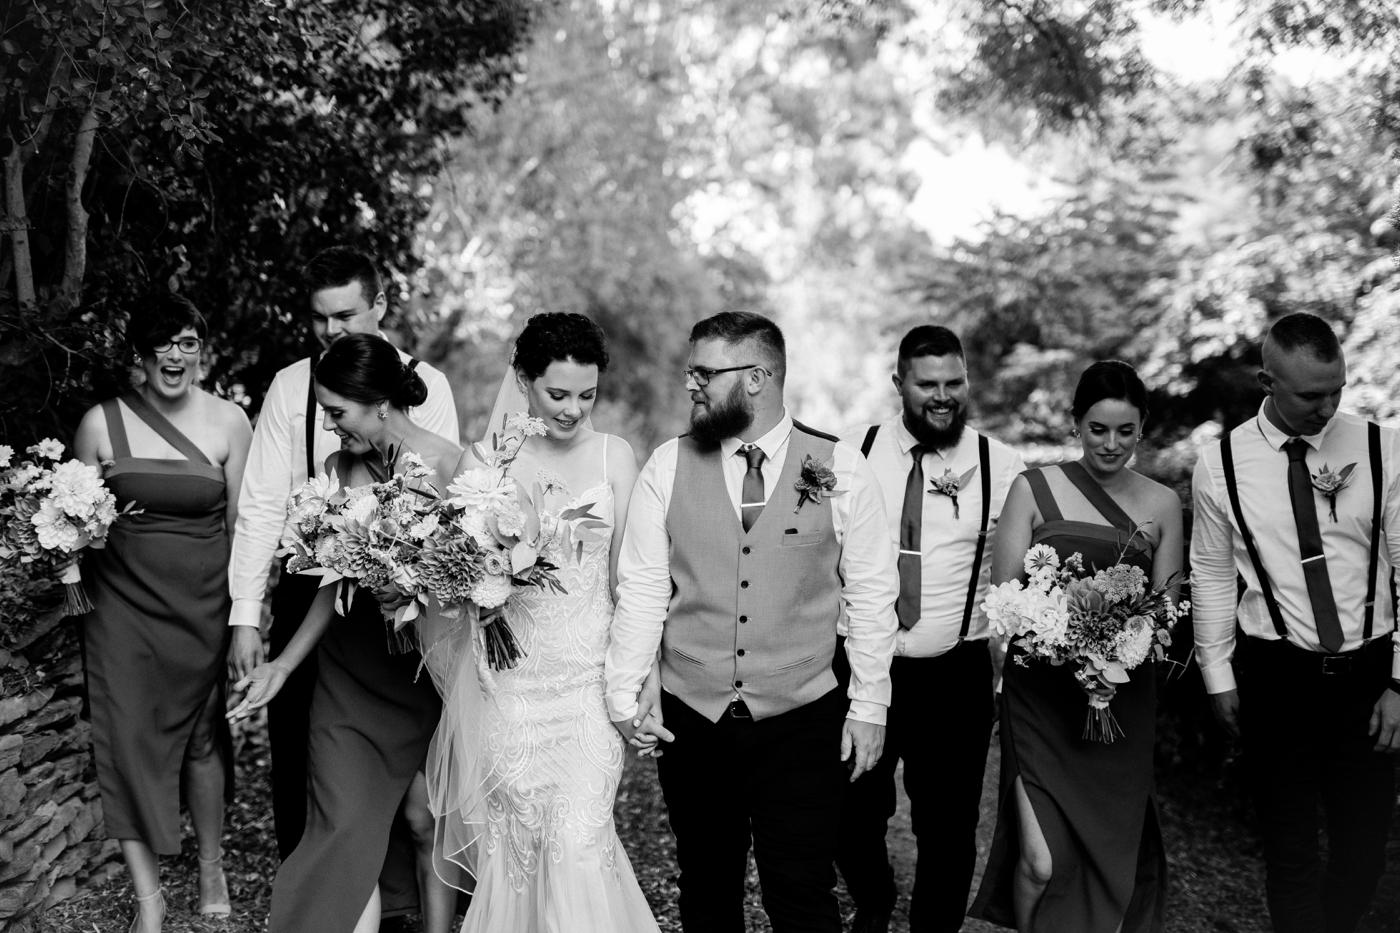 Emma & Aaron - Marybank Estate Wedding - Natural Wedding Photography in Adelaide - www.katherineschultzphotography.com_0046.jpg